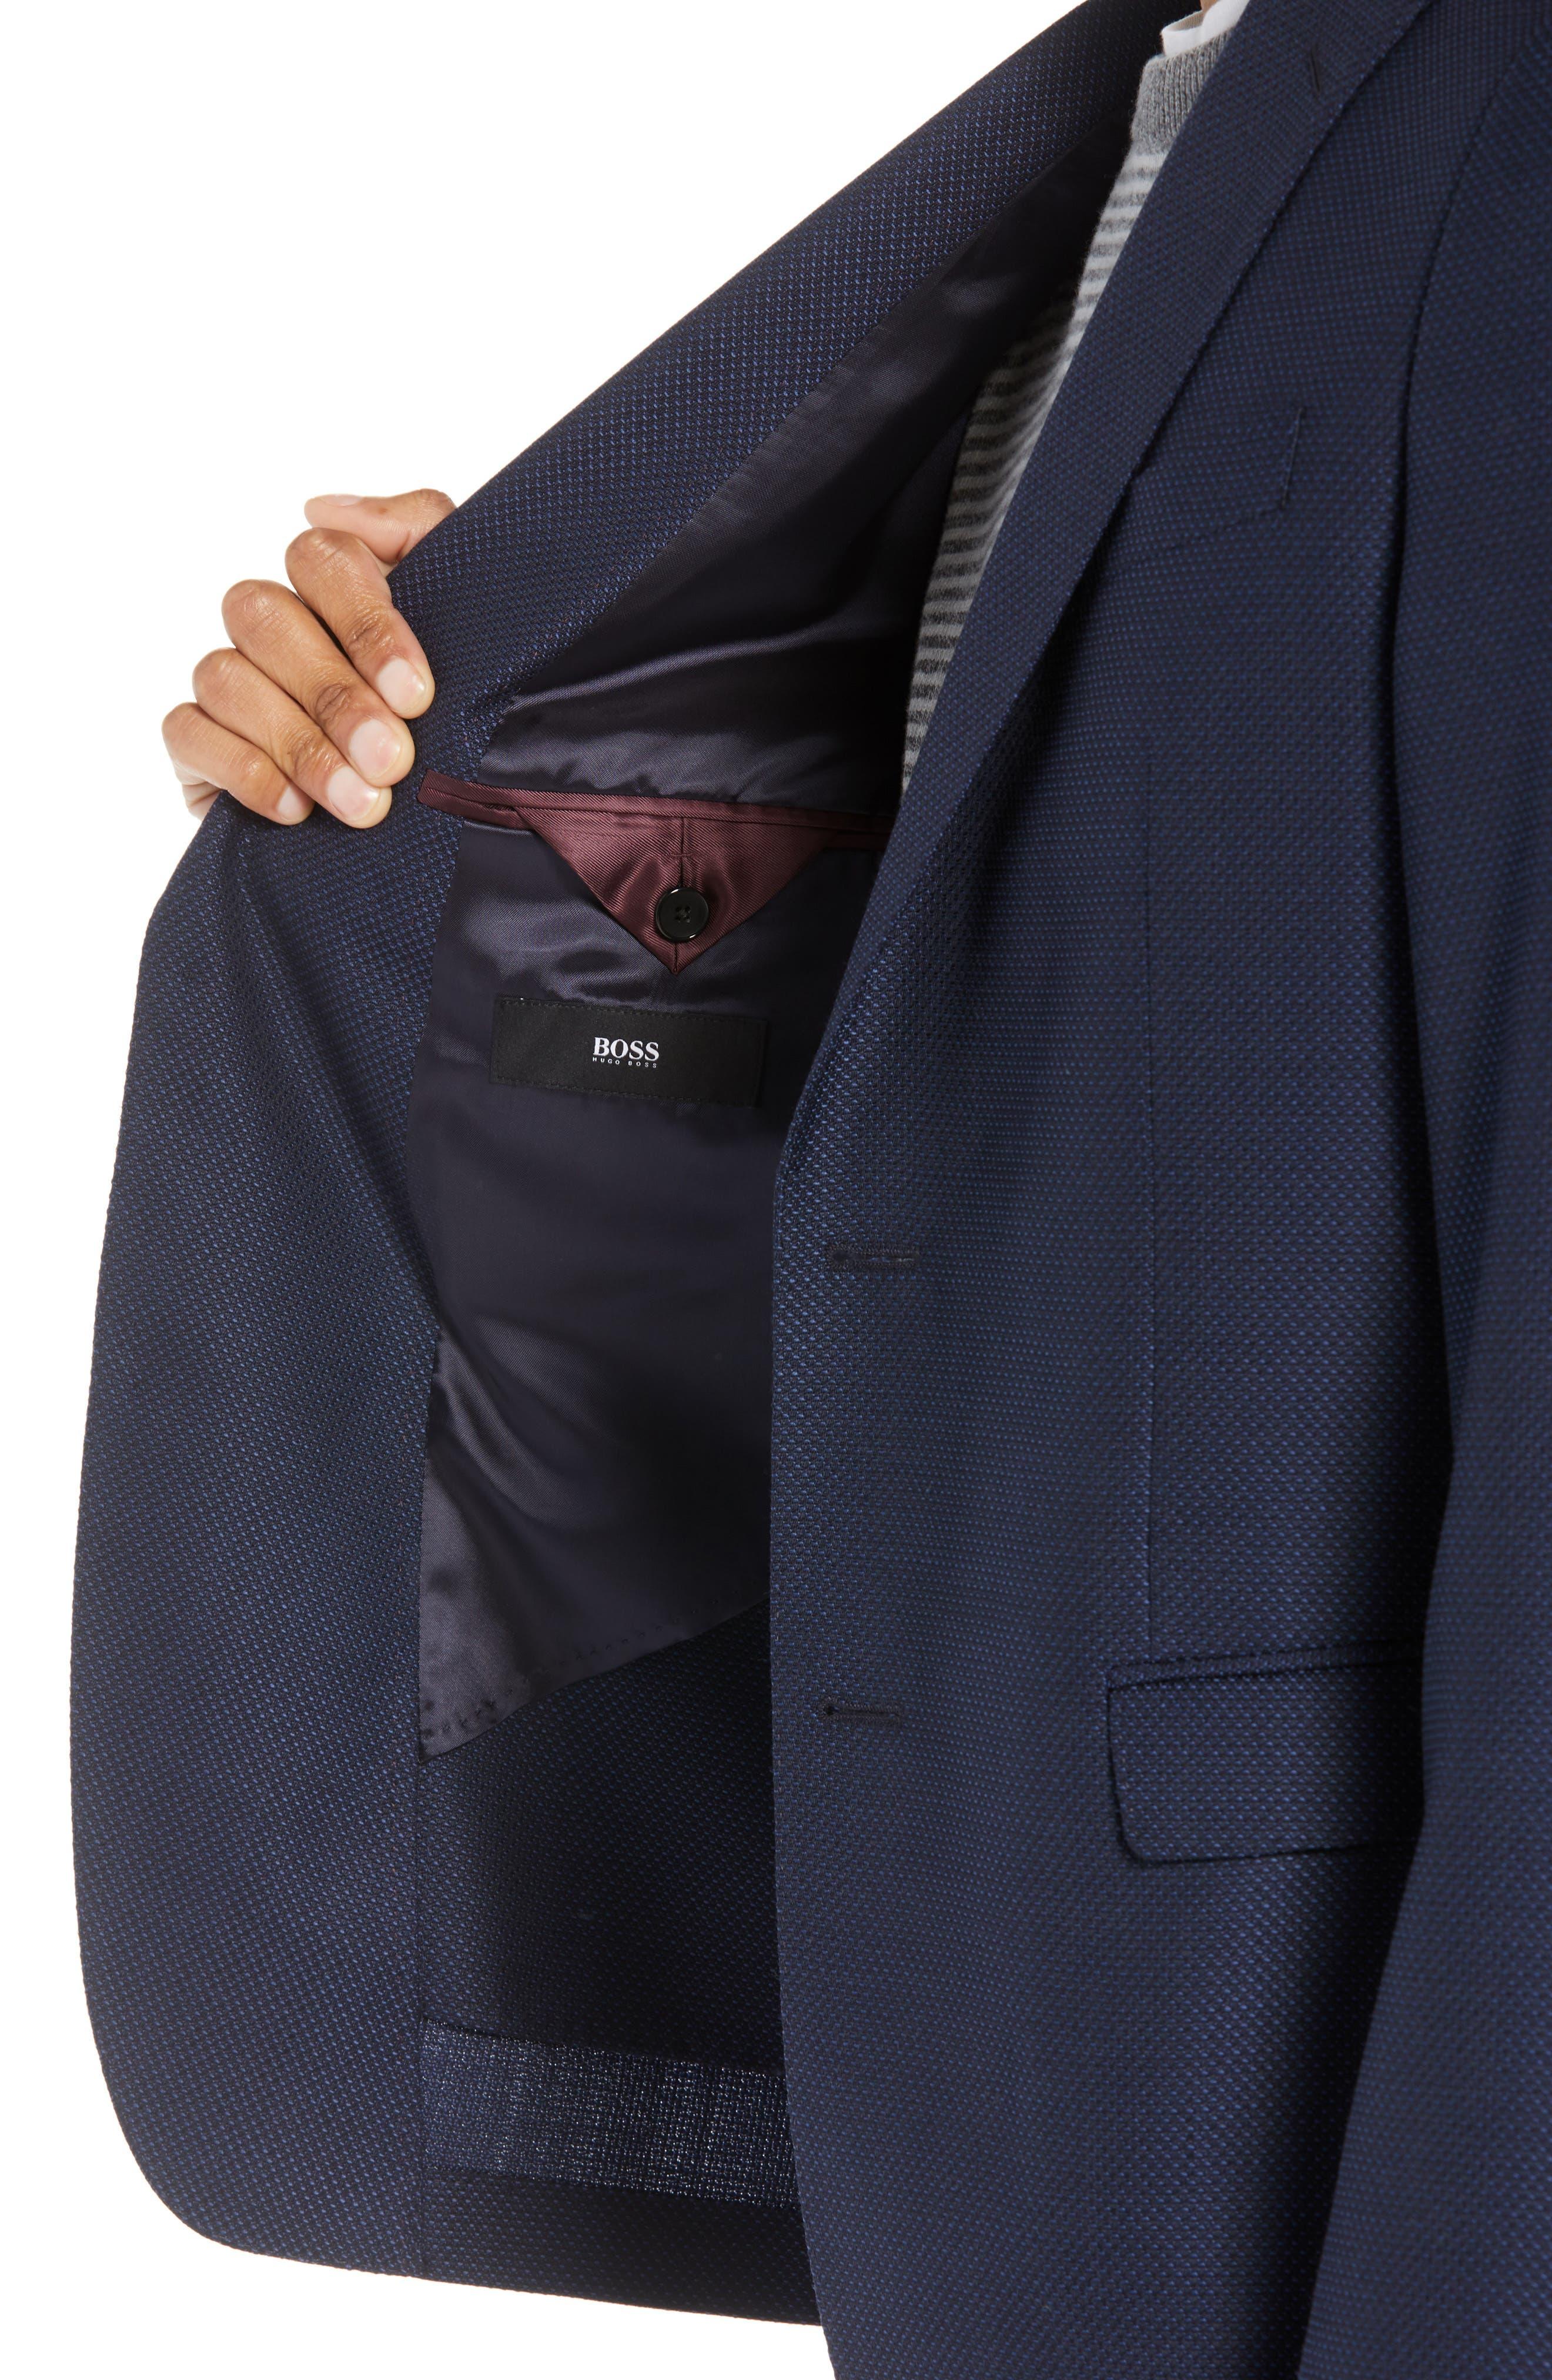 Nobis Trim Fit Wool Blazer,                             Alternate thumbnail 4, color,                             NAVY